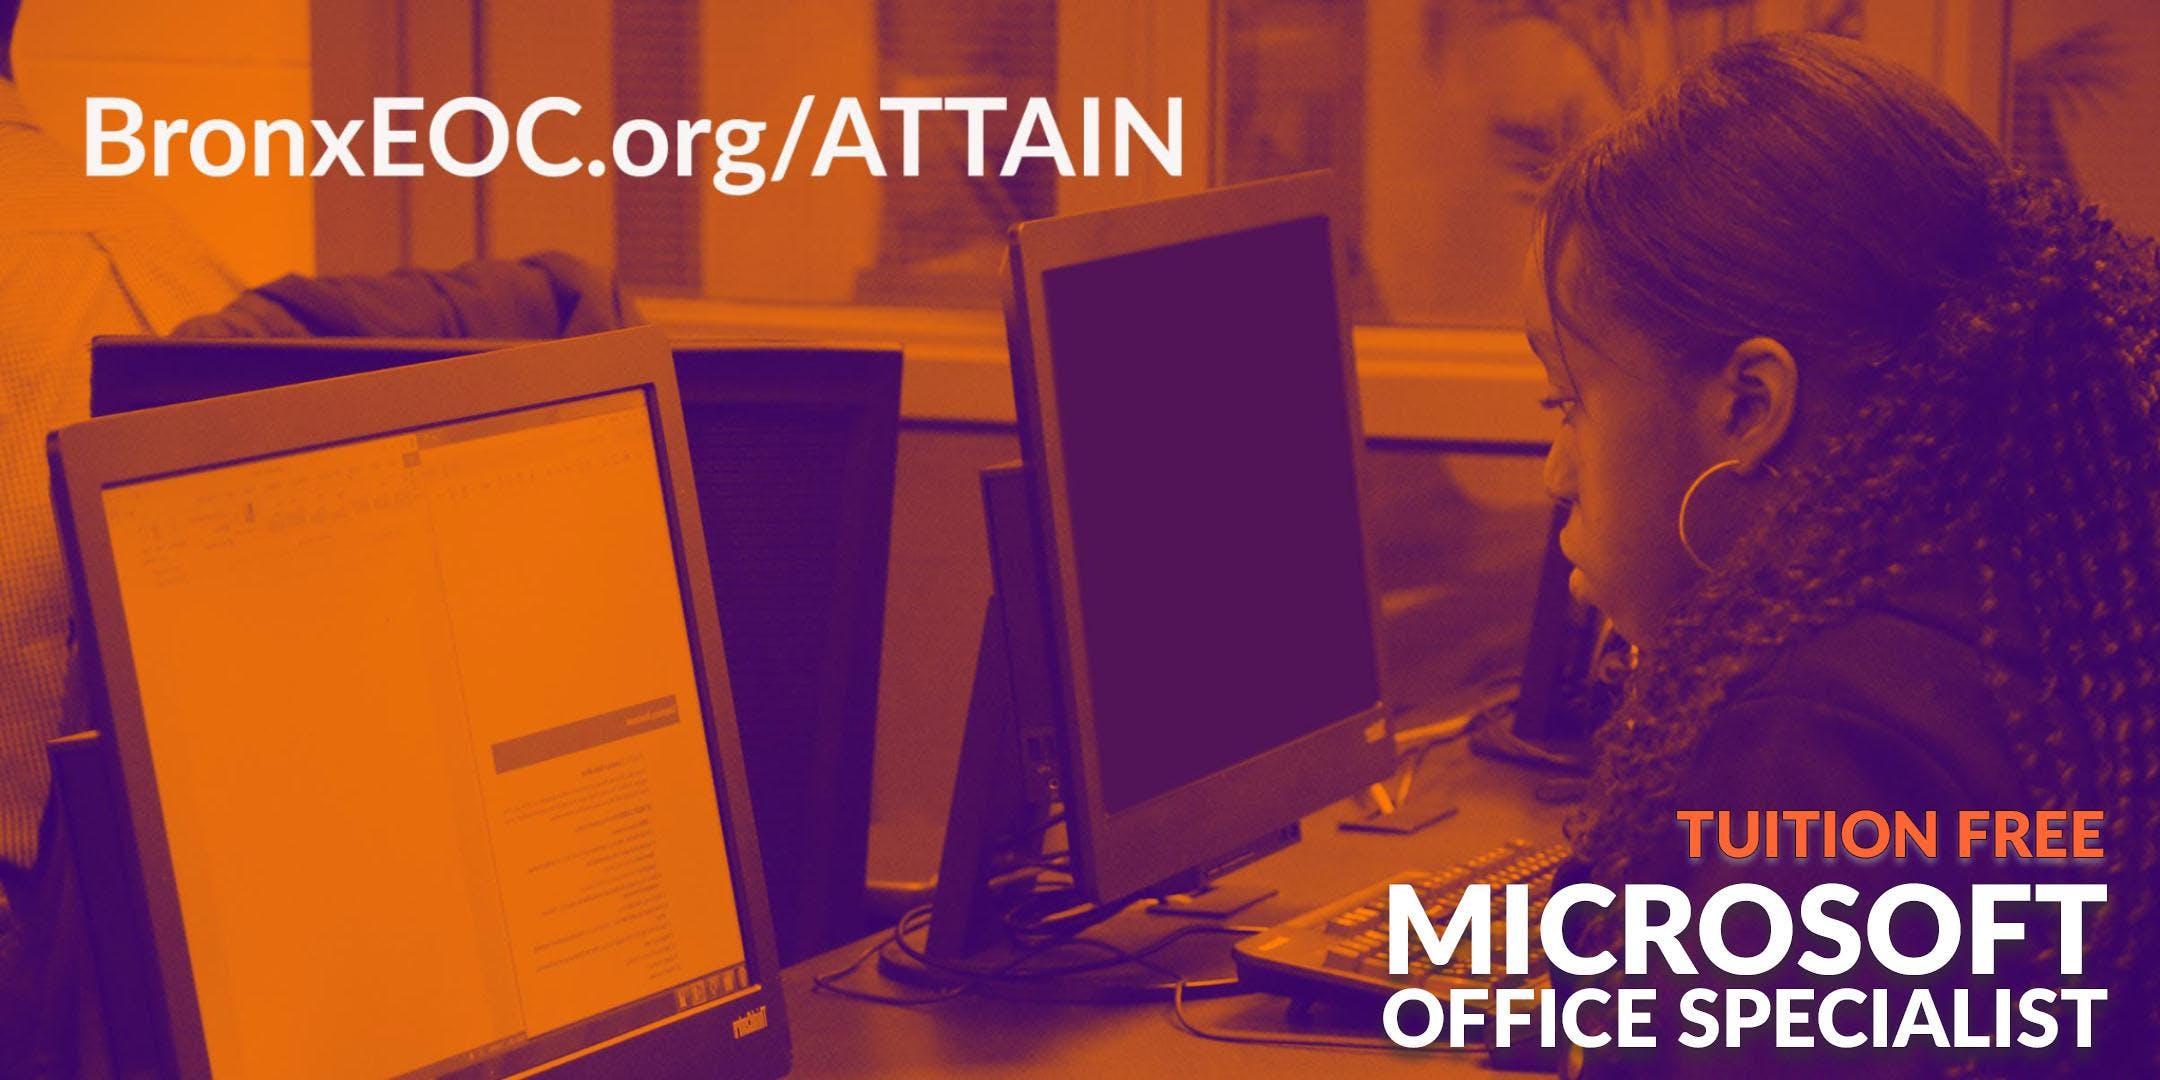 Free Microsoft Office Specialist Certification Class Apr 30 930